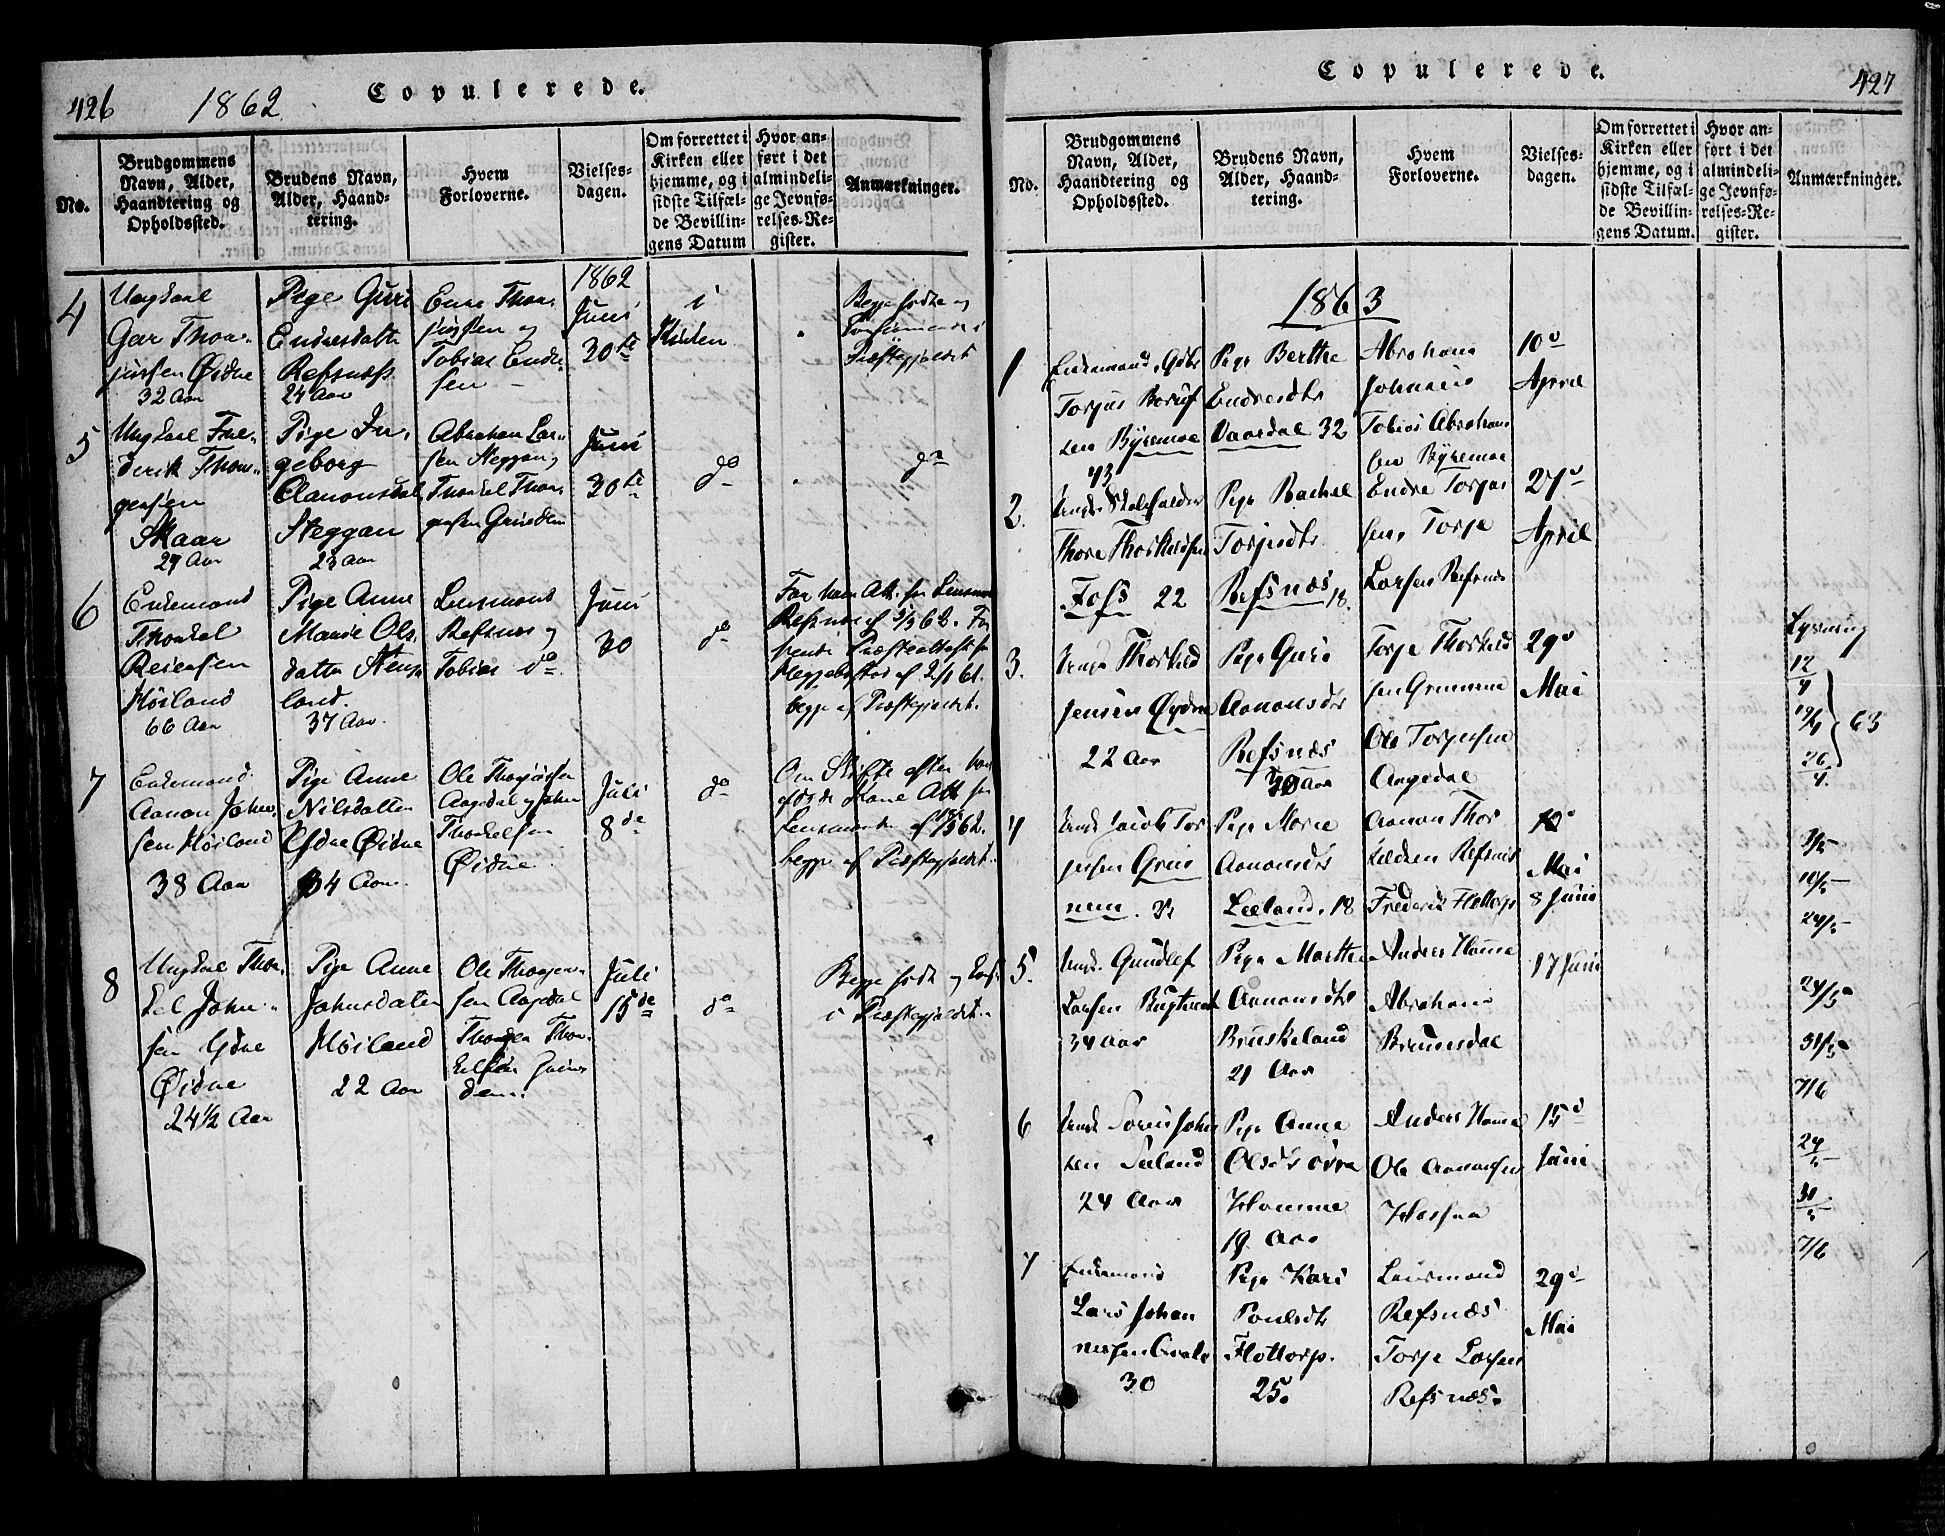 SAK, Bjelland sokneprestkontor, F/Fa/Fac/L0001: Ministerialbok nr. A 1, 1815-1866, s. 426-427